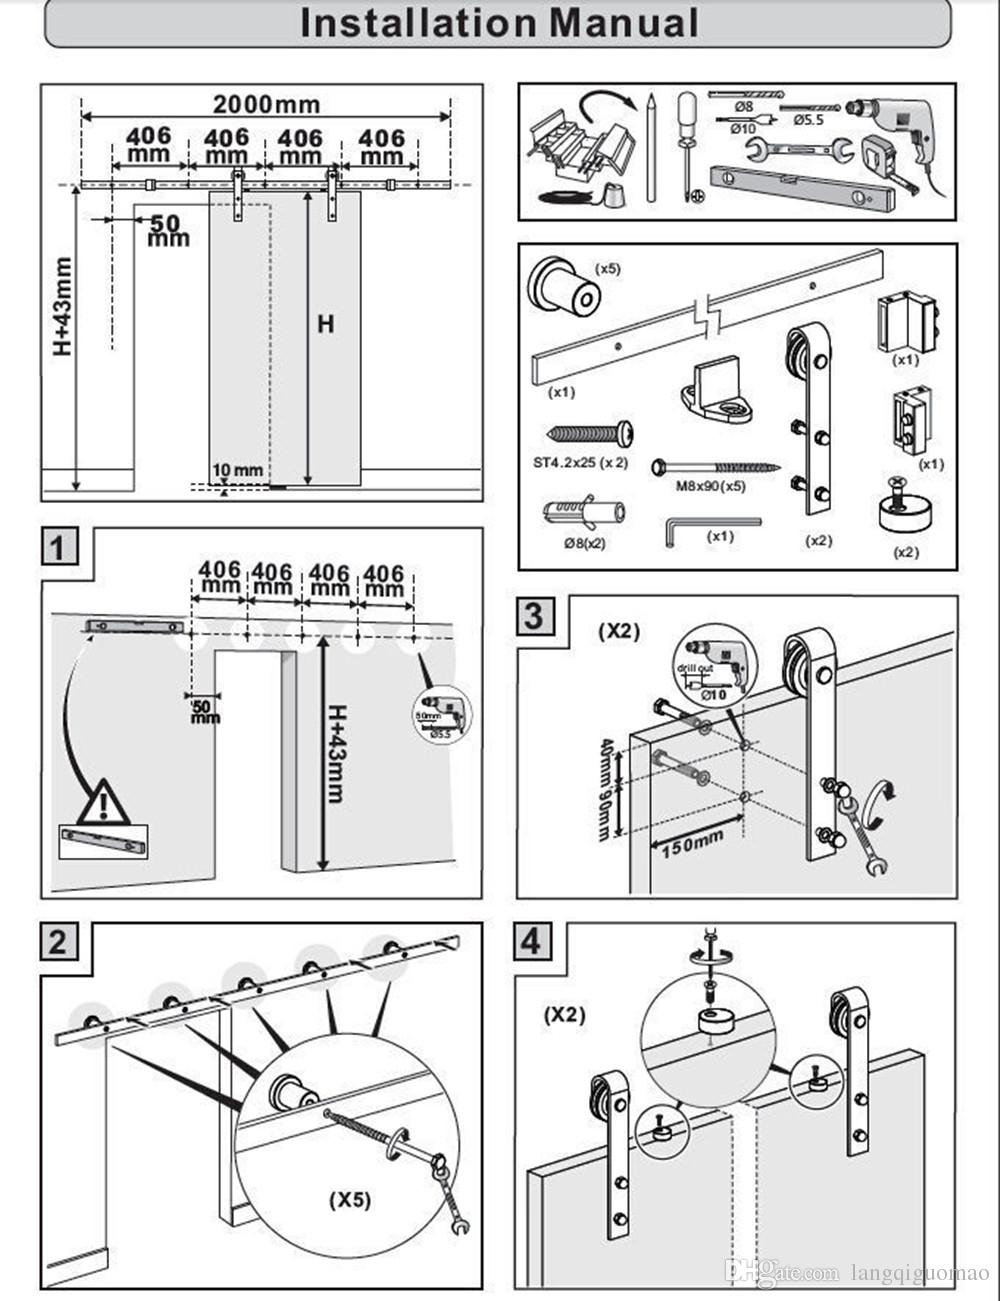 2020 10ft Black Arrow Modern European Steel Wood Sliding Barn Door Track Hardware Set Single Door Kit From Langqiguomao 179 9 Dhgate Com